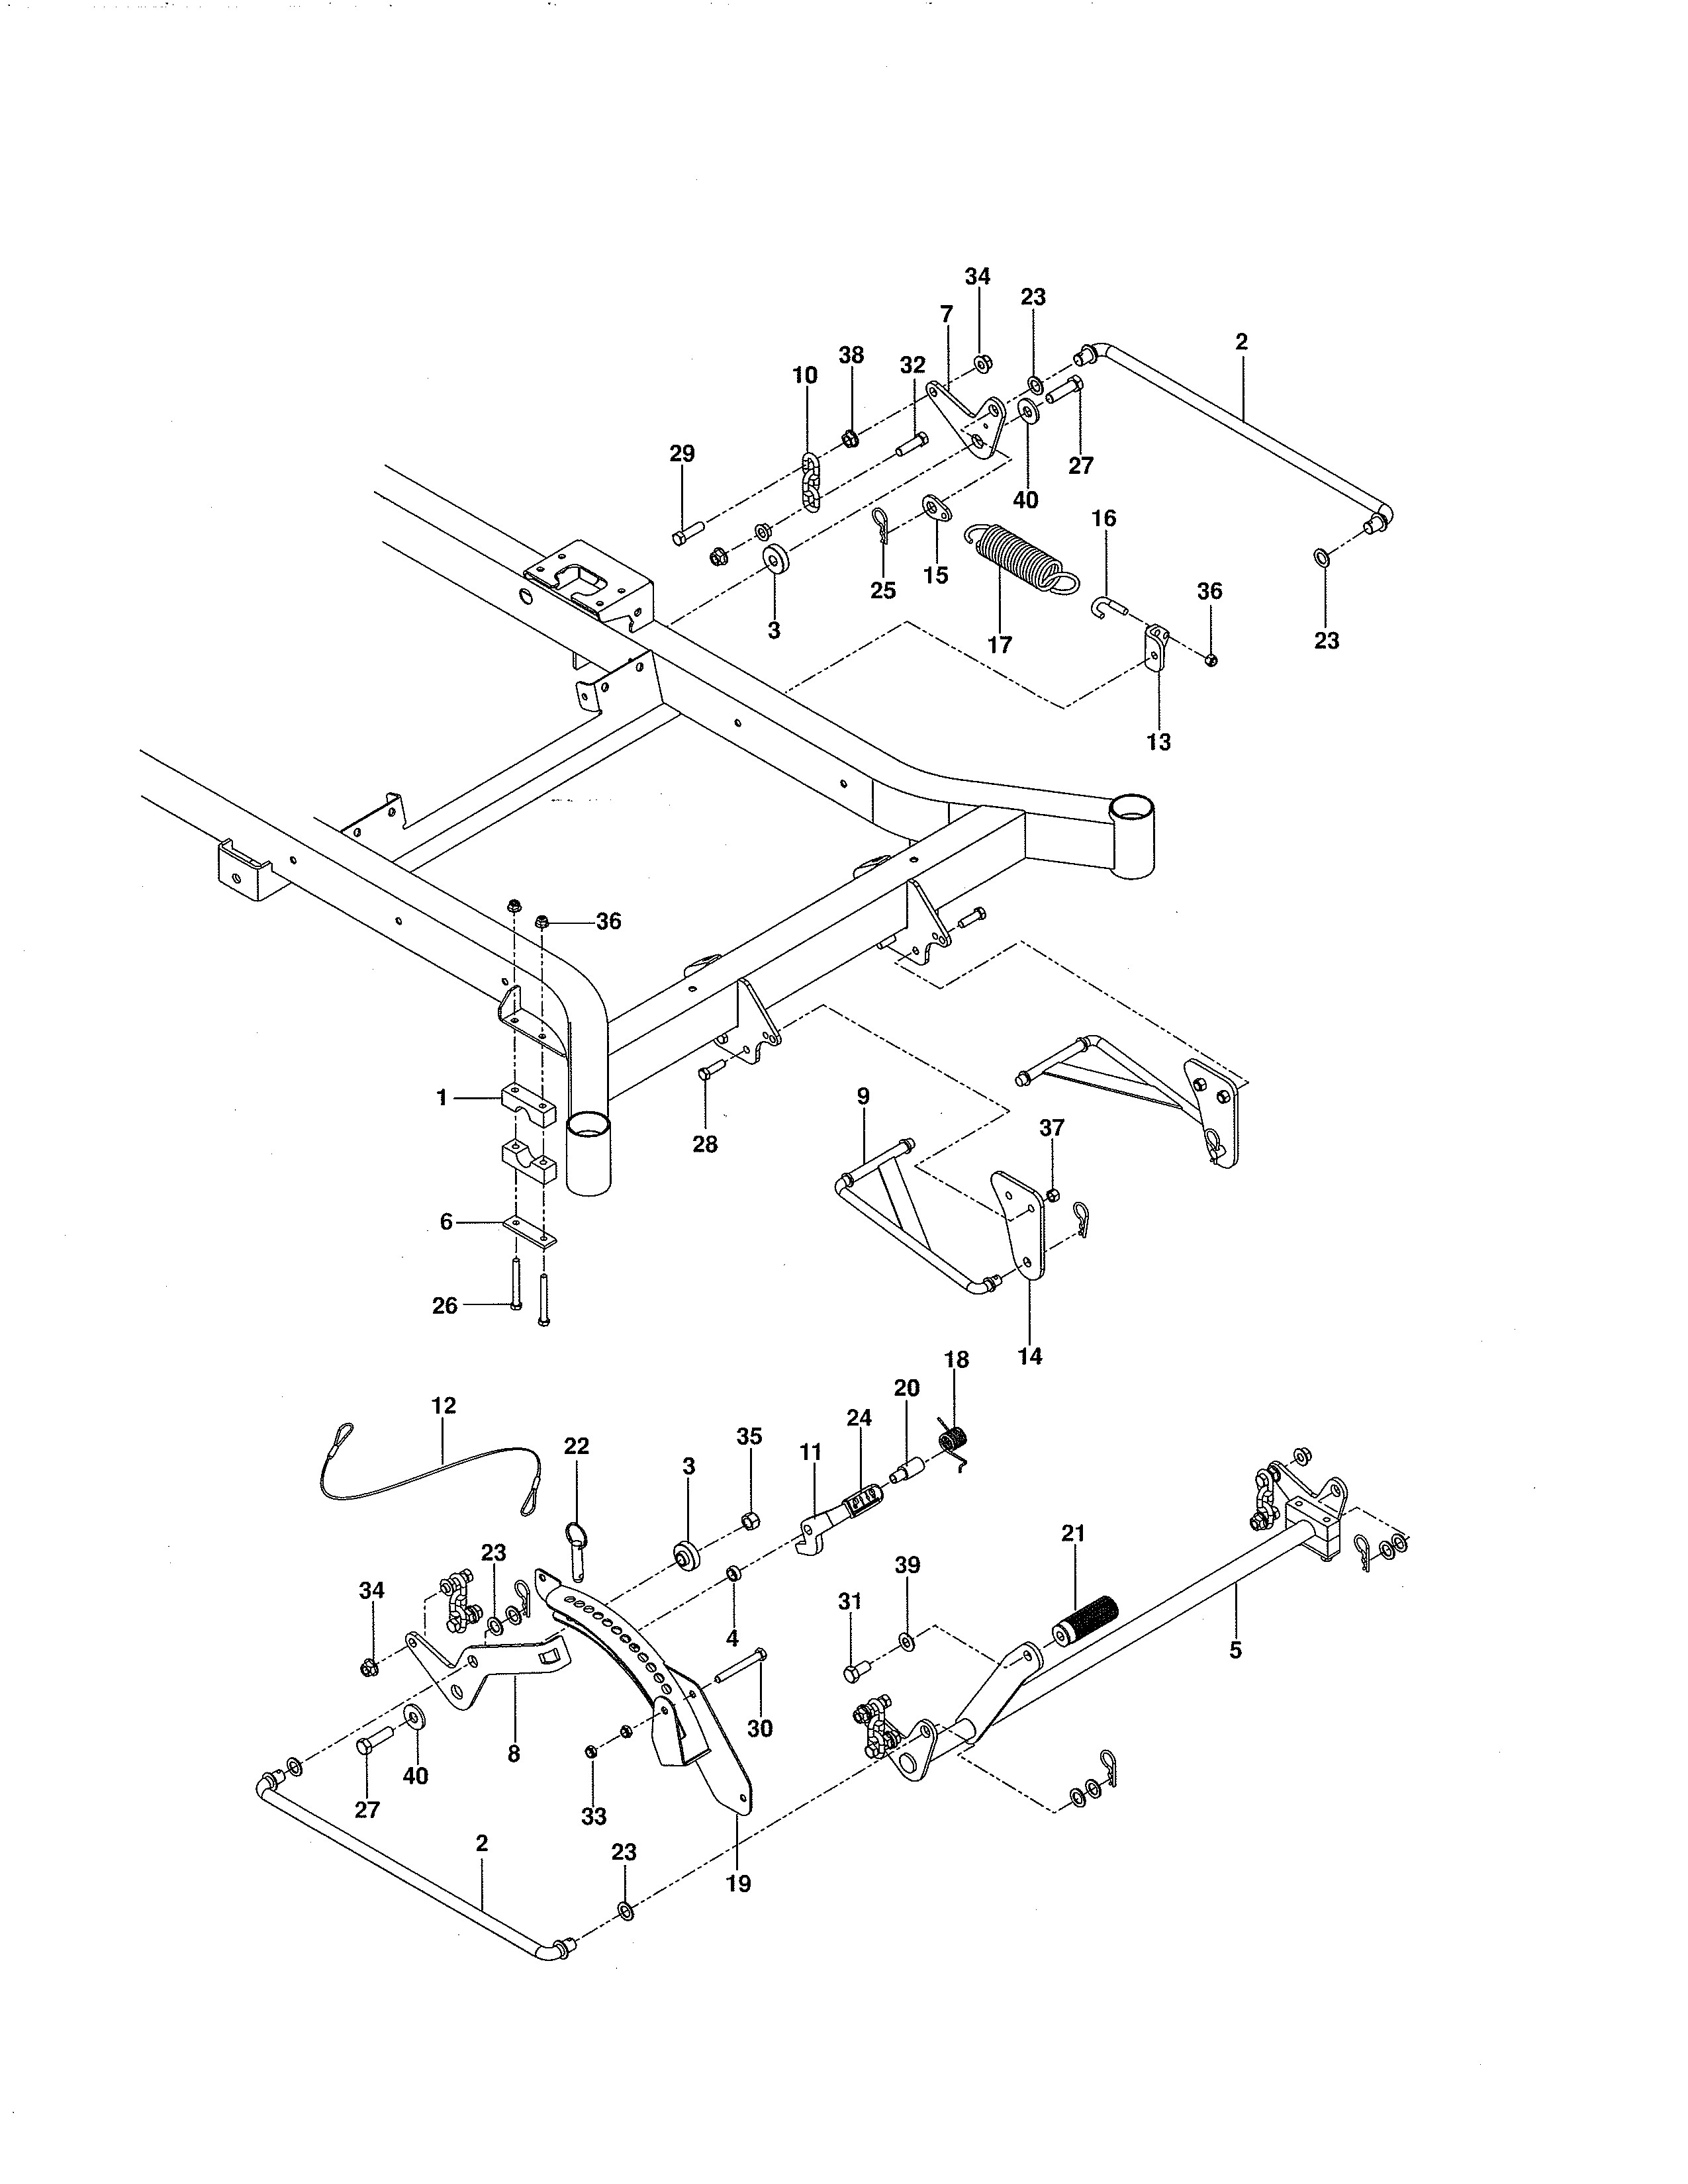 Craftsman Tractor Parts Diagram Looking for Craftsman Model Rear Engine Riding Of Craftsman Tractor Parts Diagram